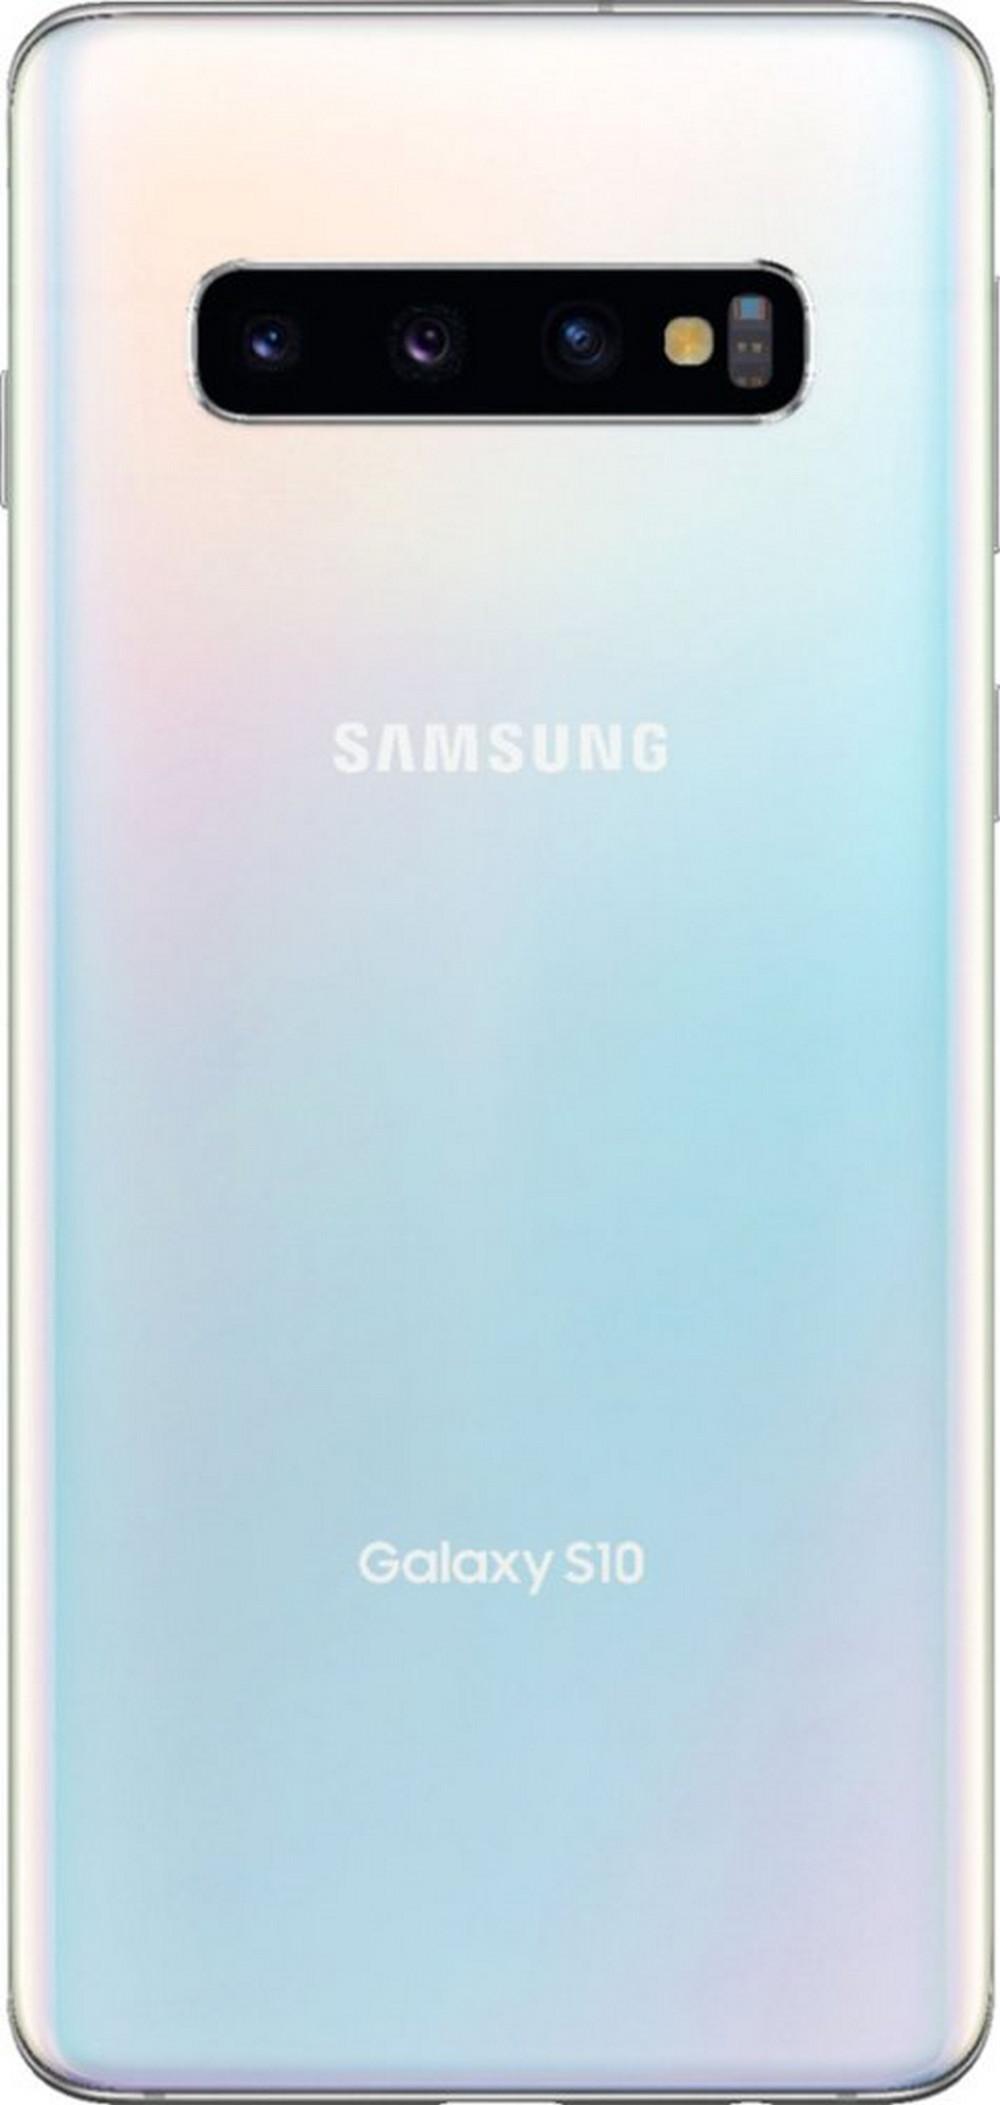 thumbnail 17 - Samsung Galaxy S10 128GB 512GB, Unlocked AT&T Verizon TMO Sprint, All Colors (P)